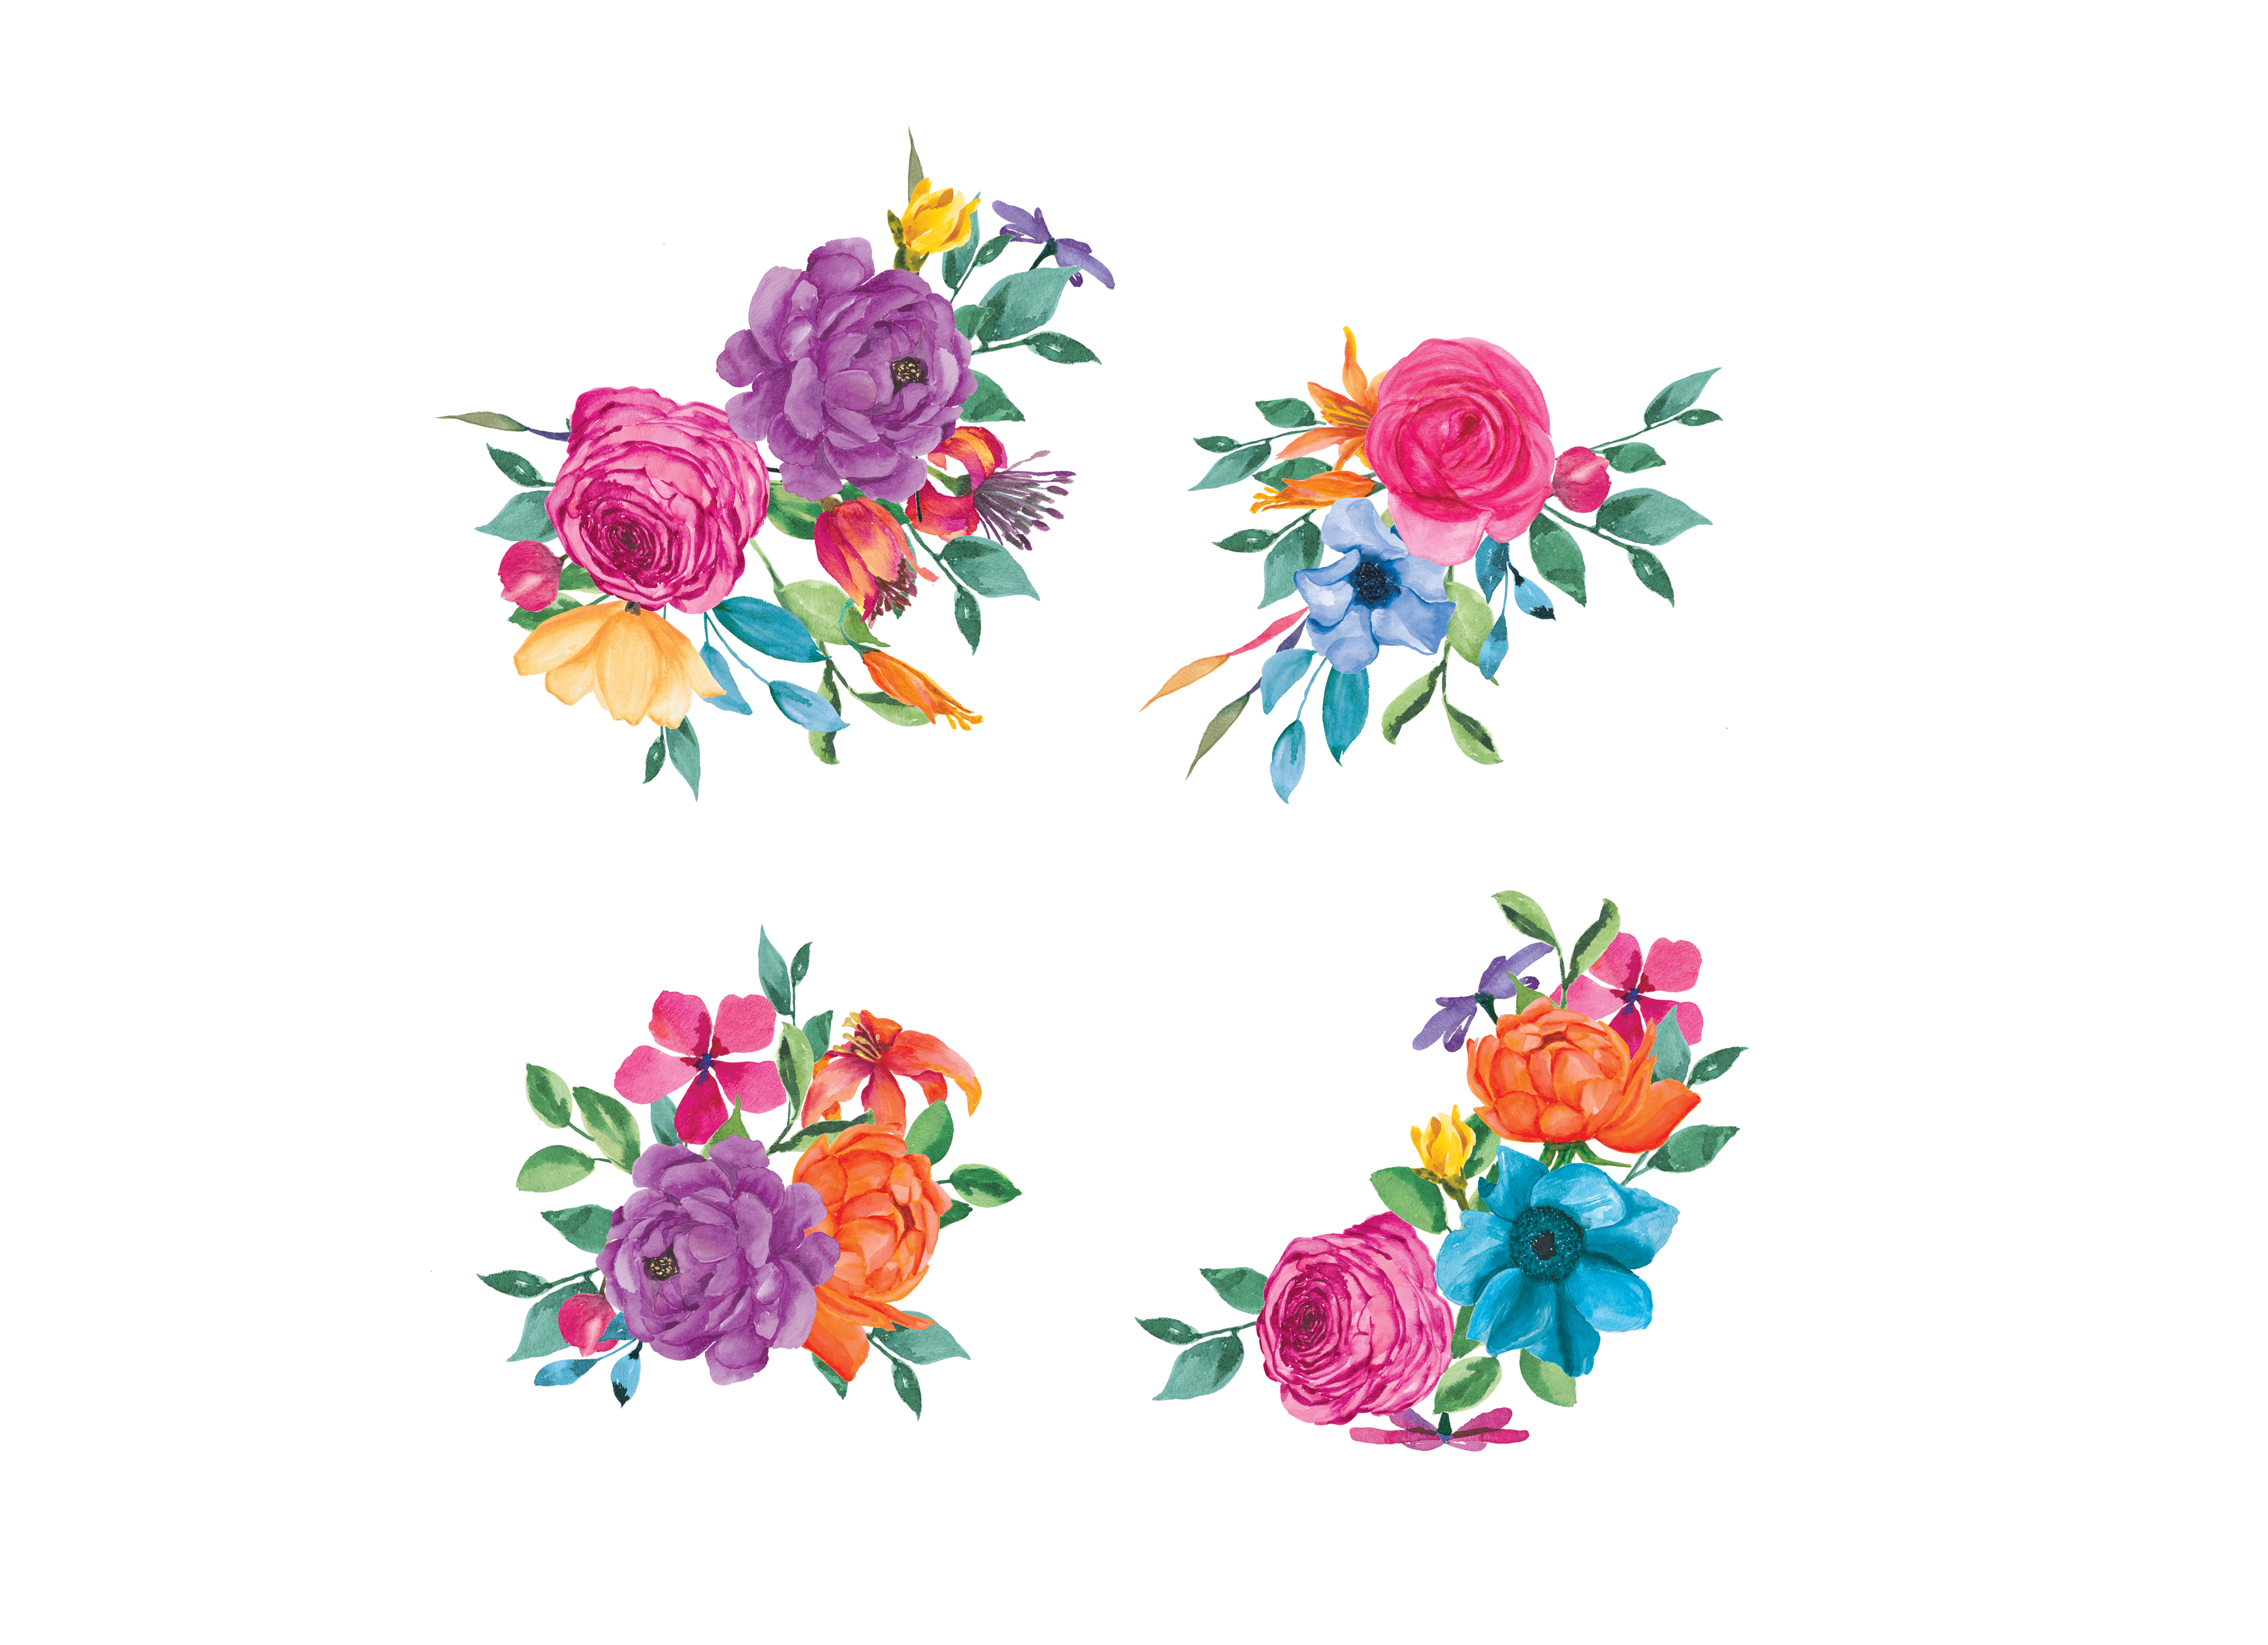 colorful watercolor floral clipart hand design bundles rh designbundles net floral clipart transparent floral clipart png